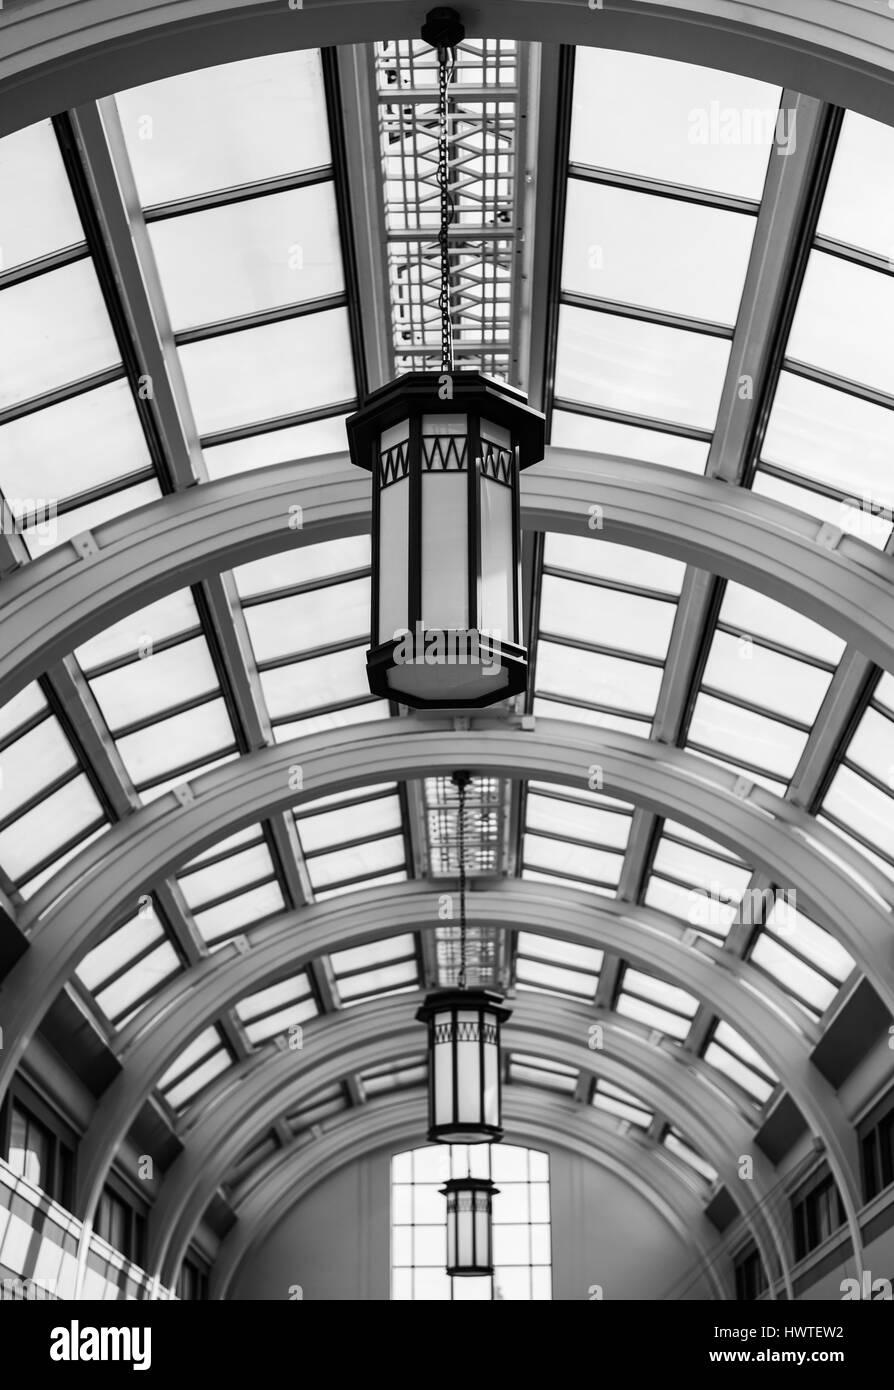 Villa Marina Arcade Glass Roof, Douglas, isle Of Man - Stock Image